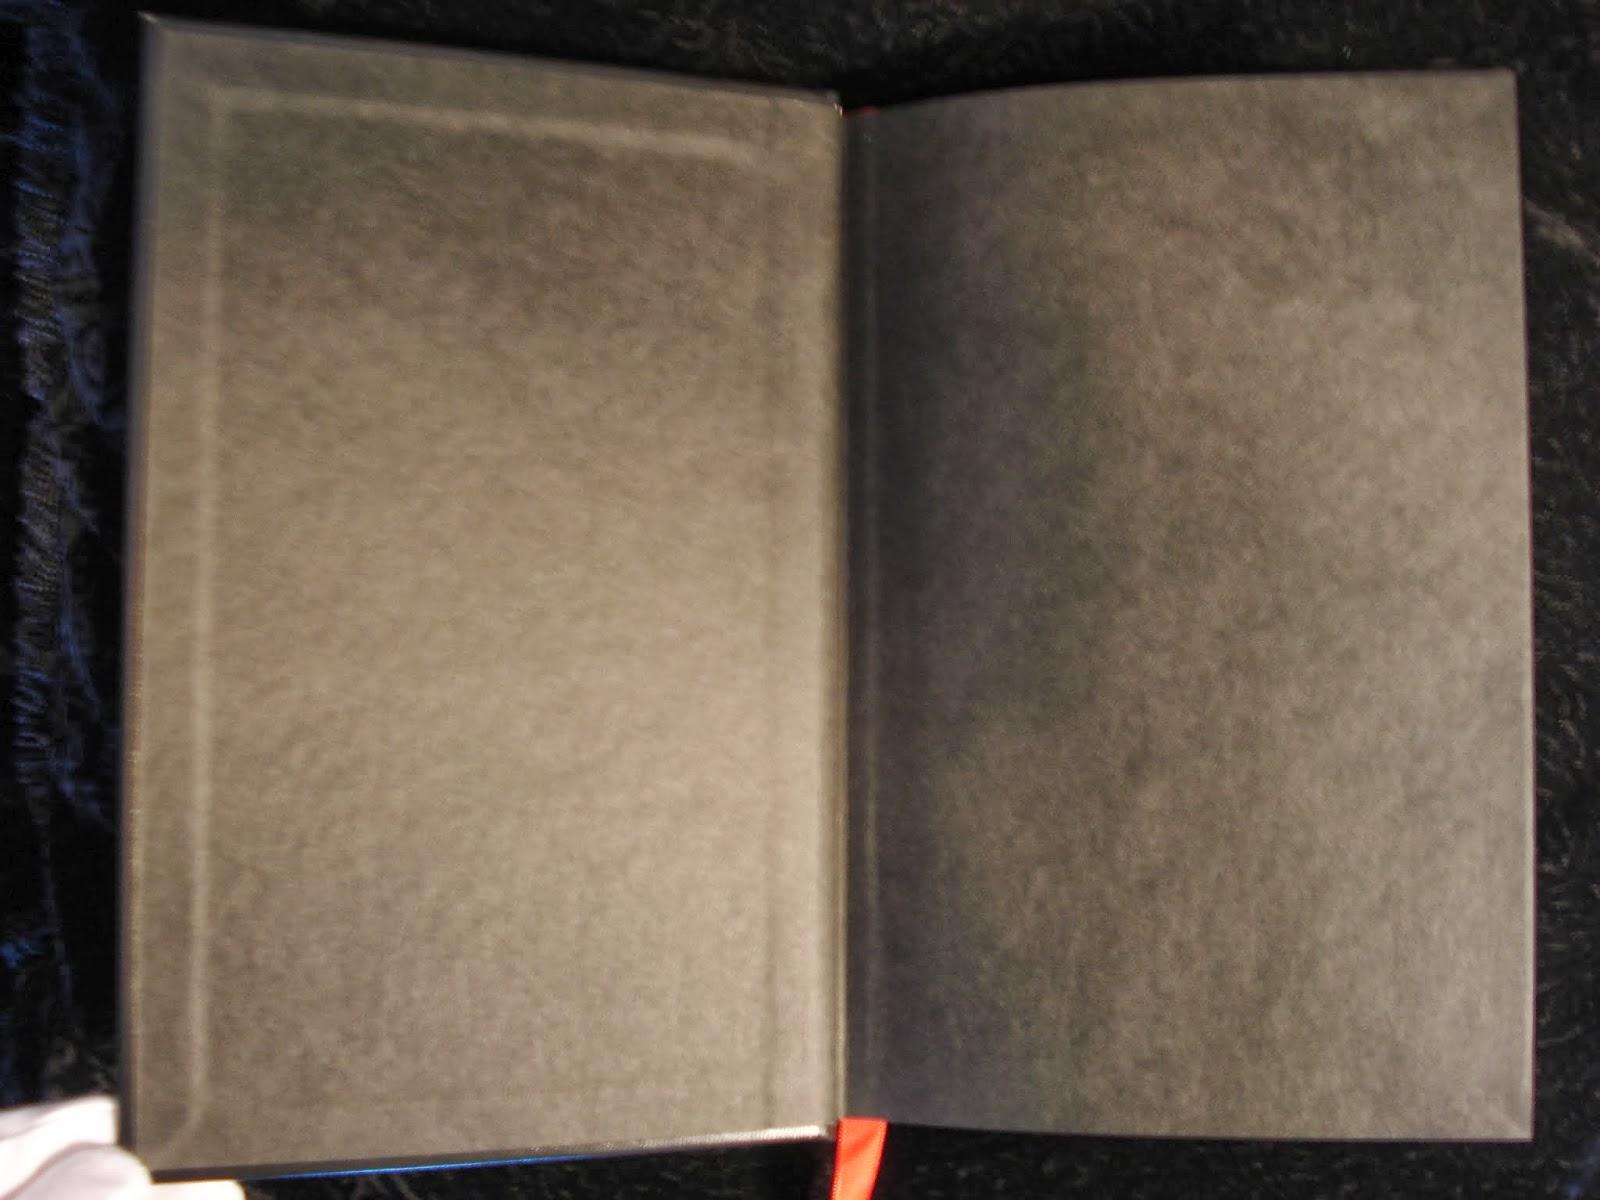 Balkans arcane bindings the book of azazel the grimoire of the balkans arcane bindings the book of azazel the grimoire of the damned by e a koetting fandeluxe Images